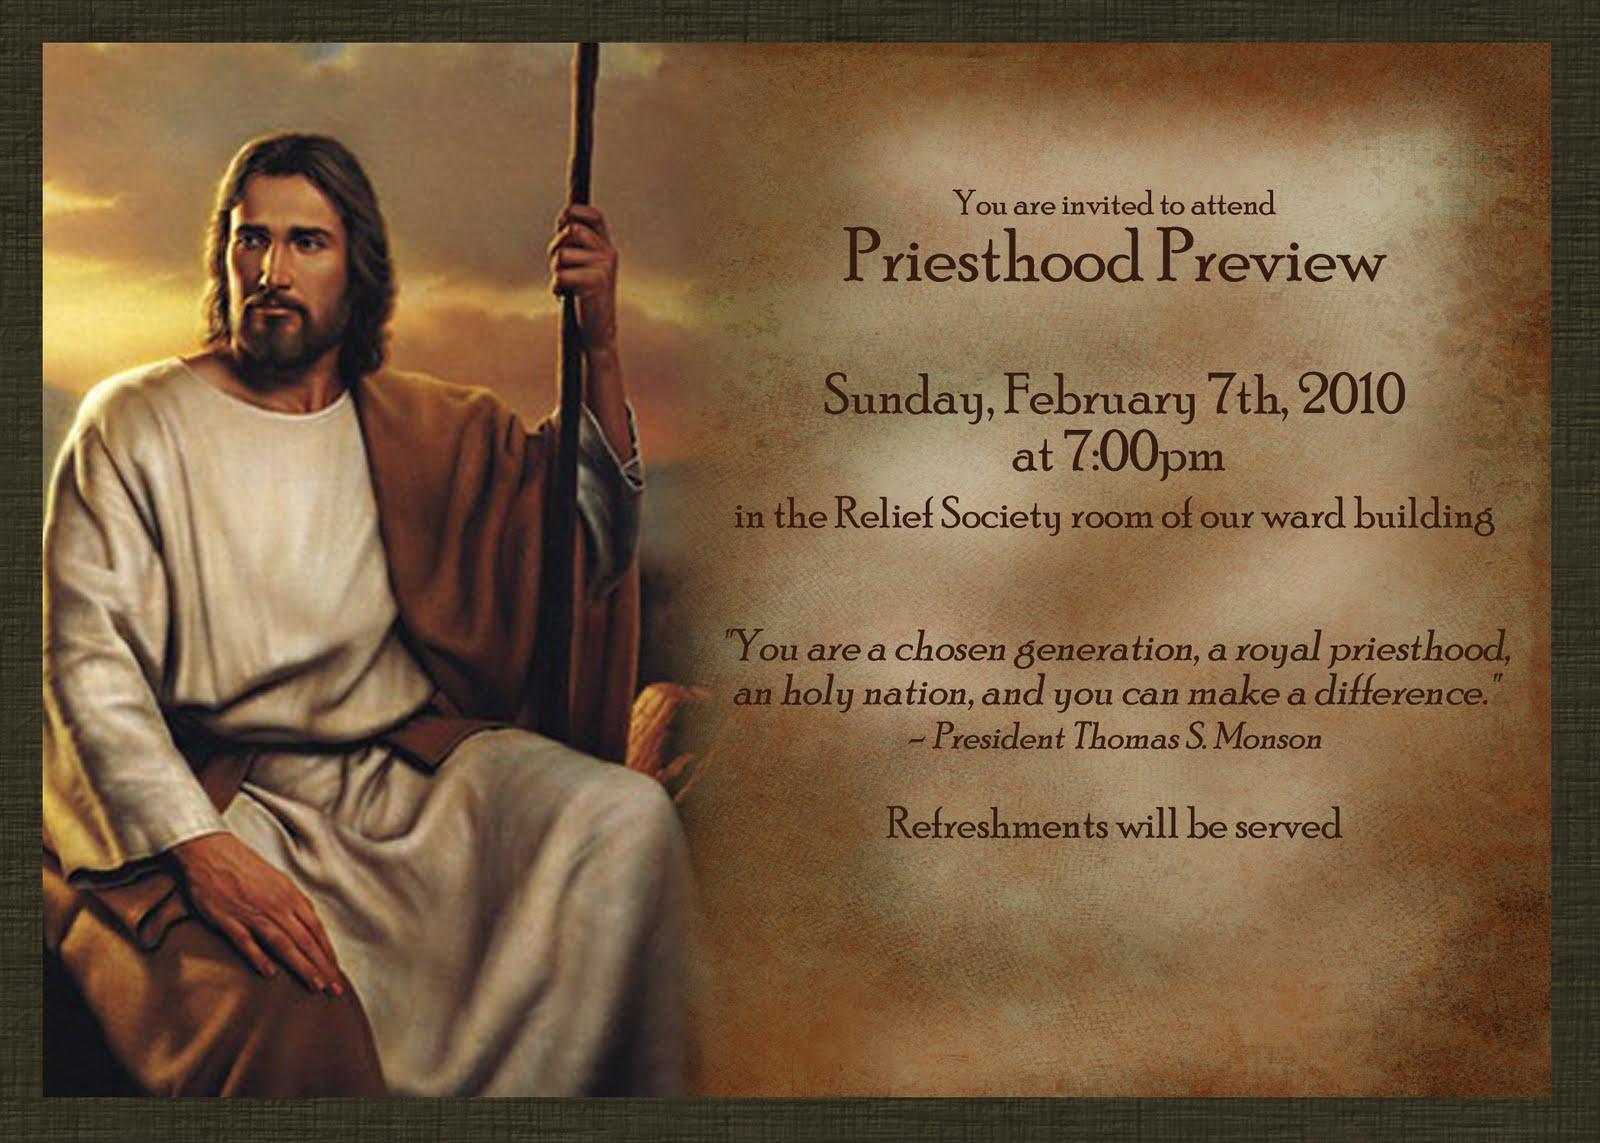 Priesthood Preview Invite ($10)